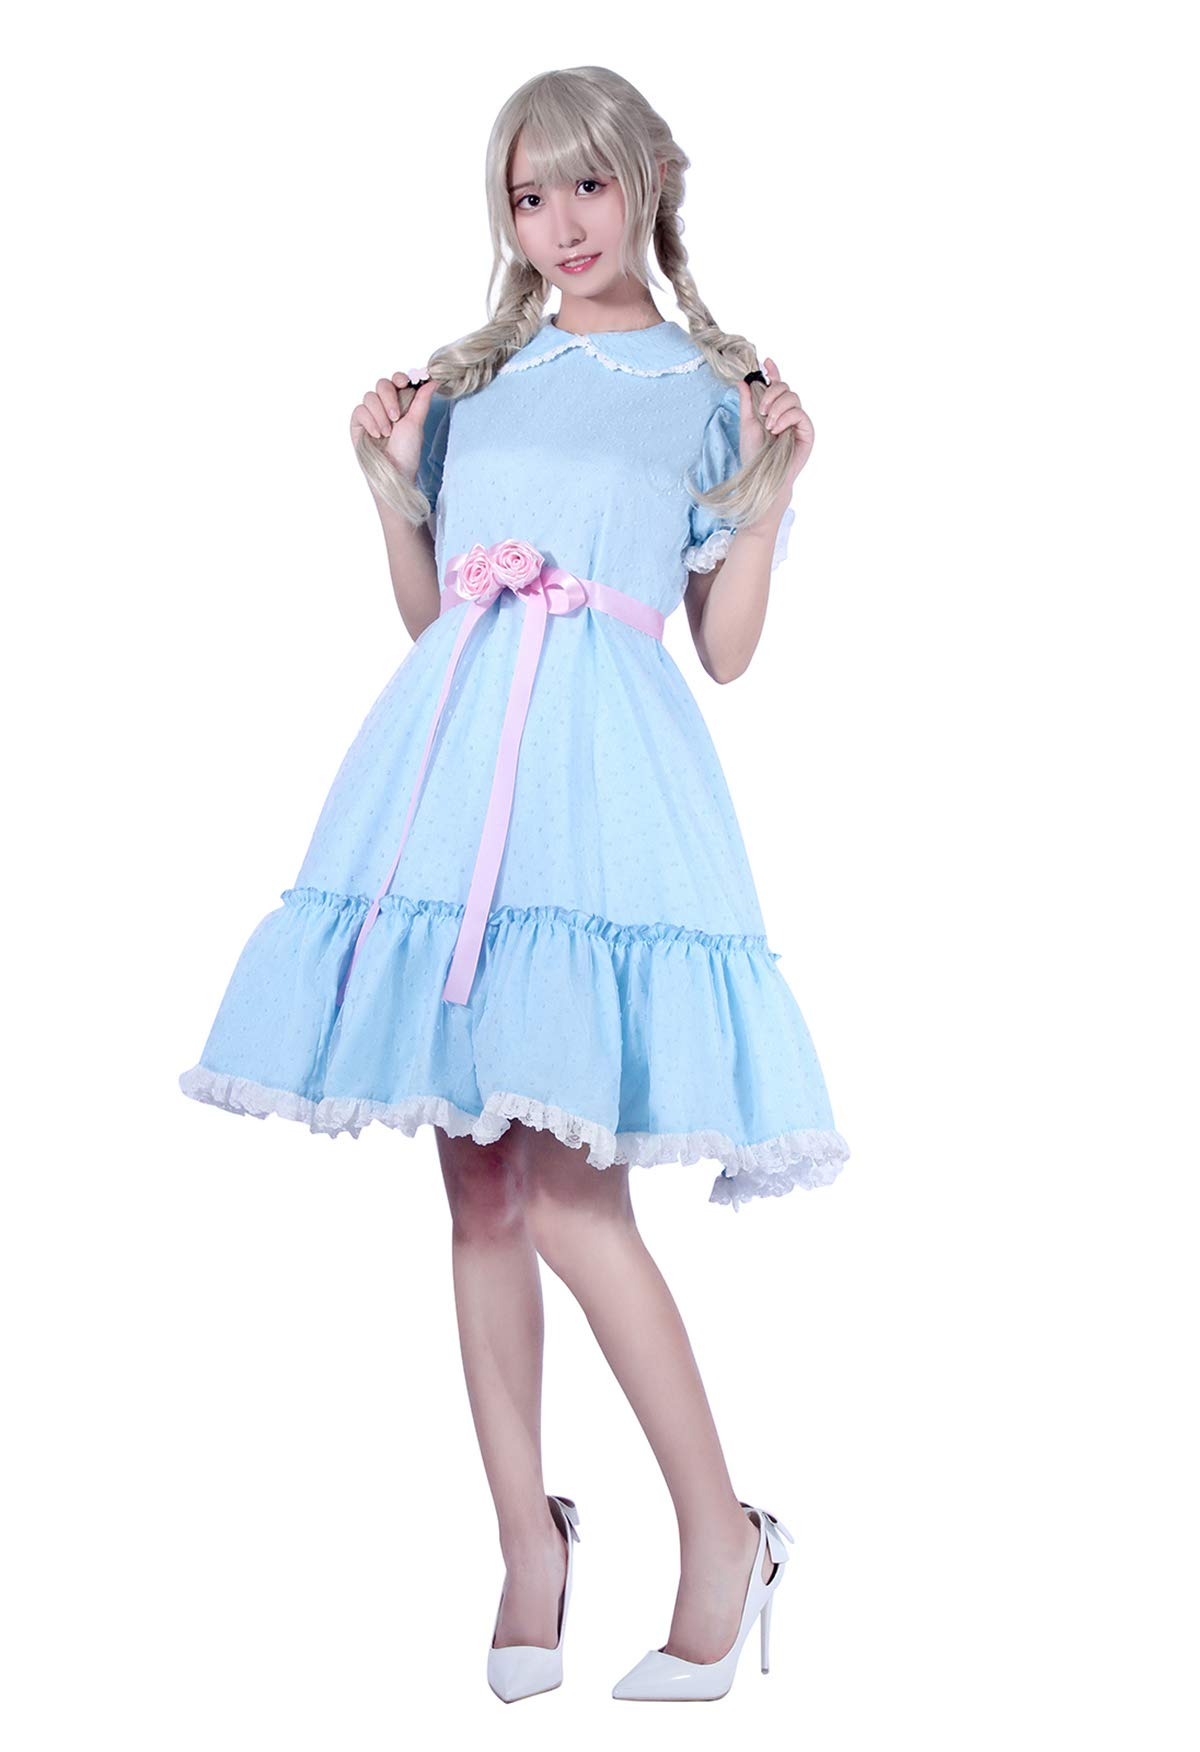 Nuoqi Women's Girls Sweet Lolita Dress Blue Cotton Bow Puff Skirts Doll Collar Short Sleeve Costumes